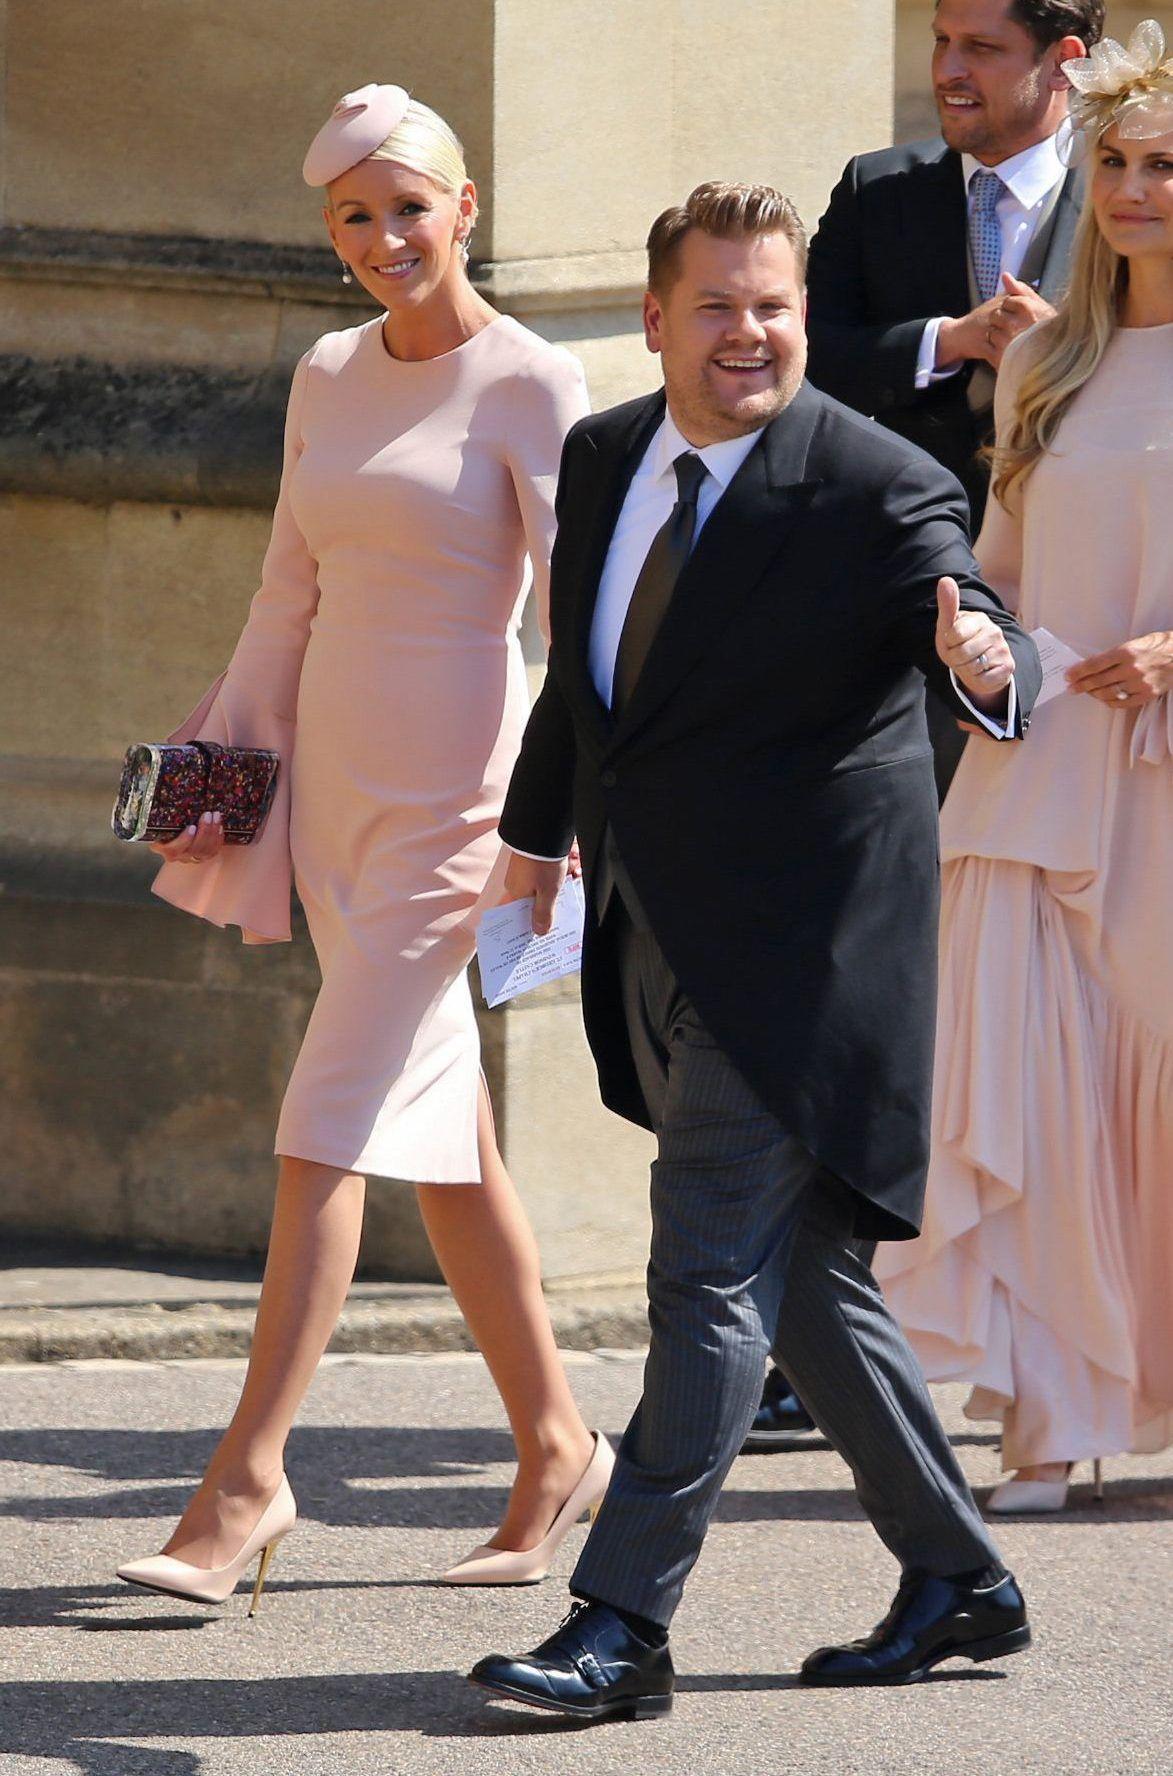 Greets Fans As He And Wife Julia Carey Go Inside Windsor Castle